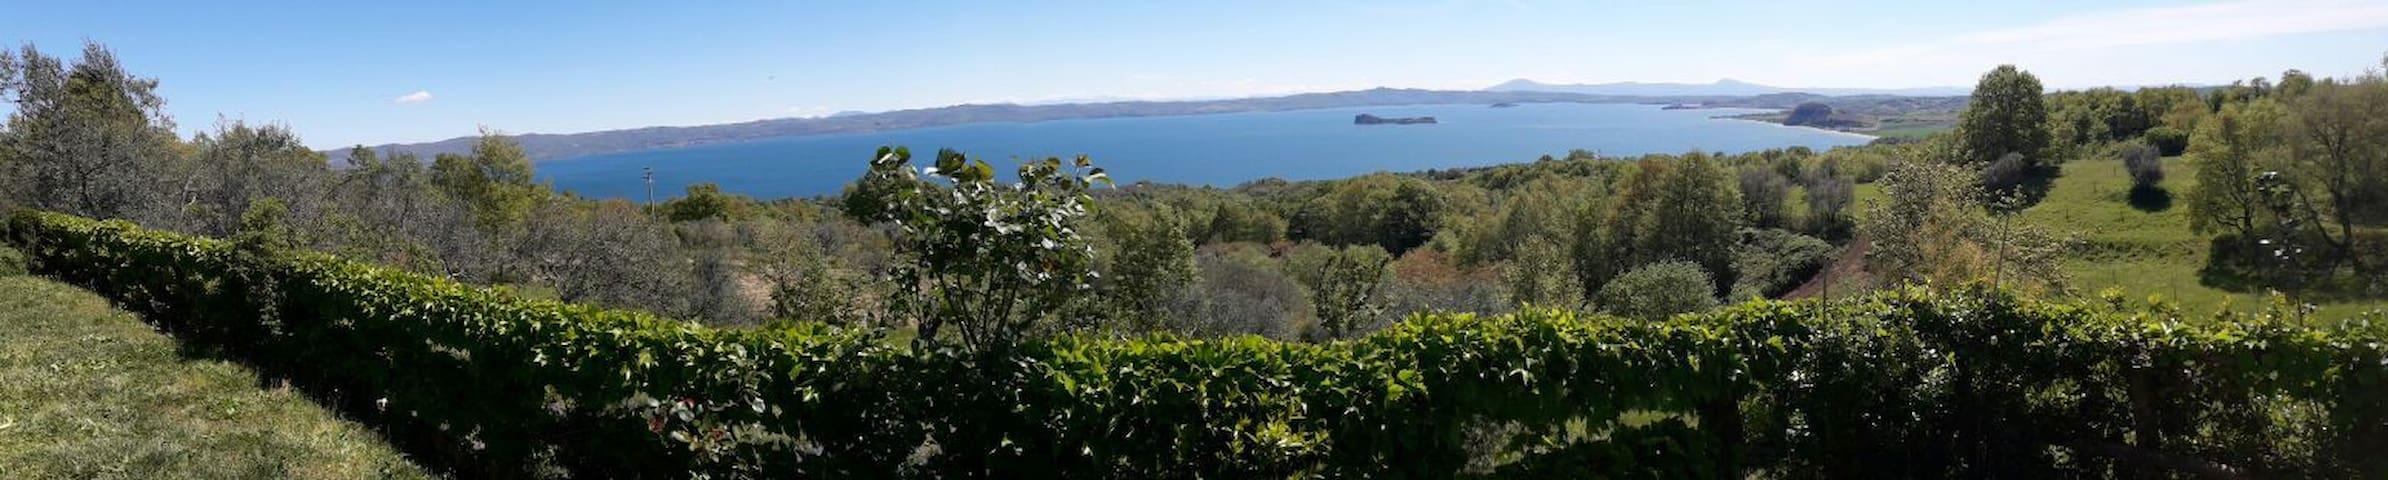 Vista panoramica e tranquillità - Gradoli - Huis